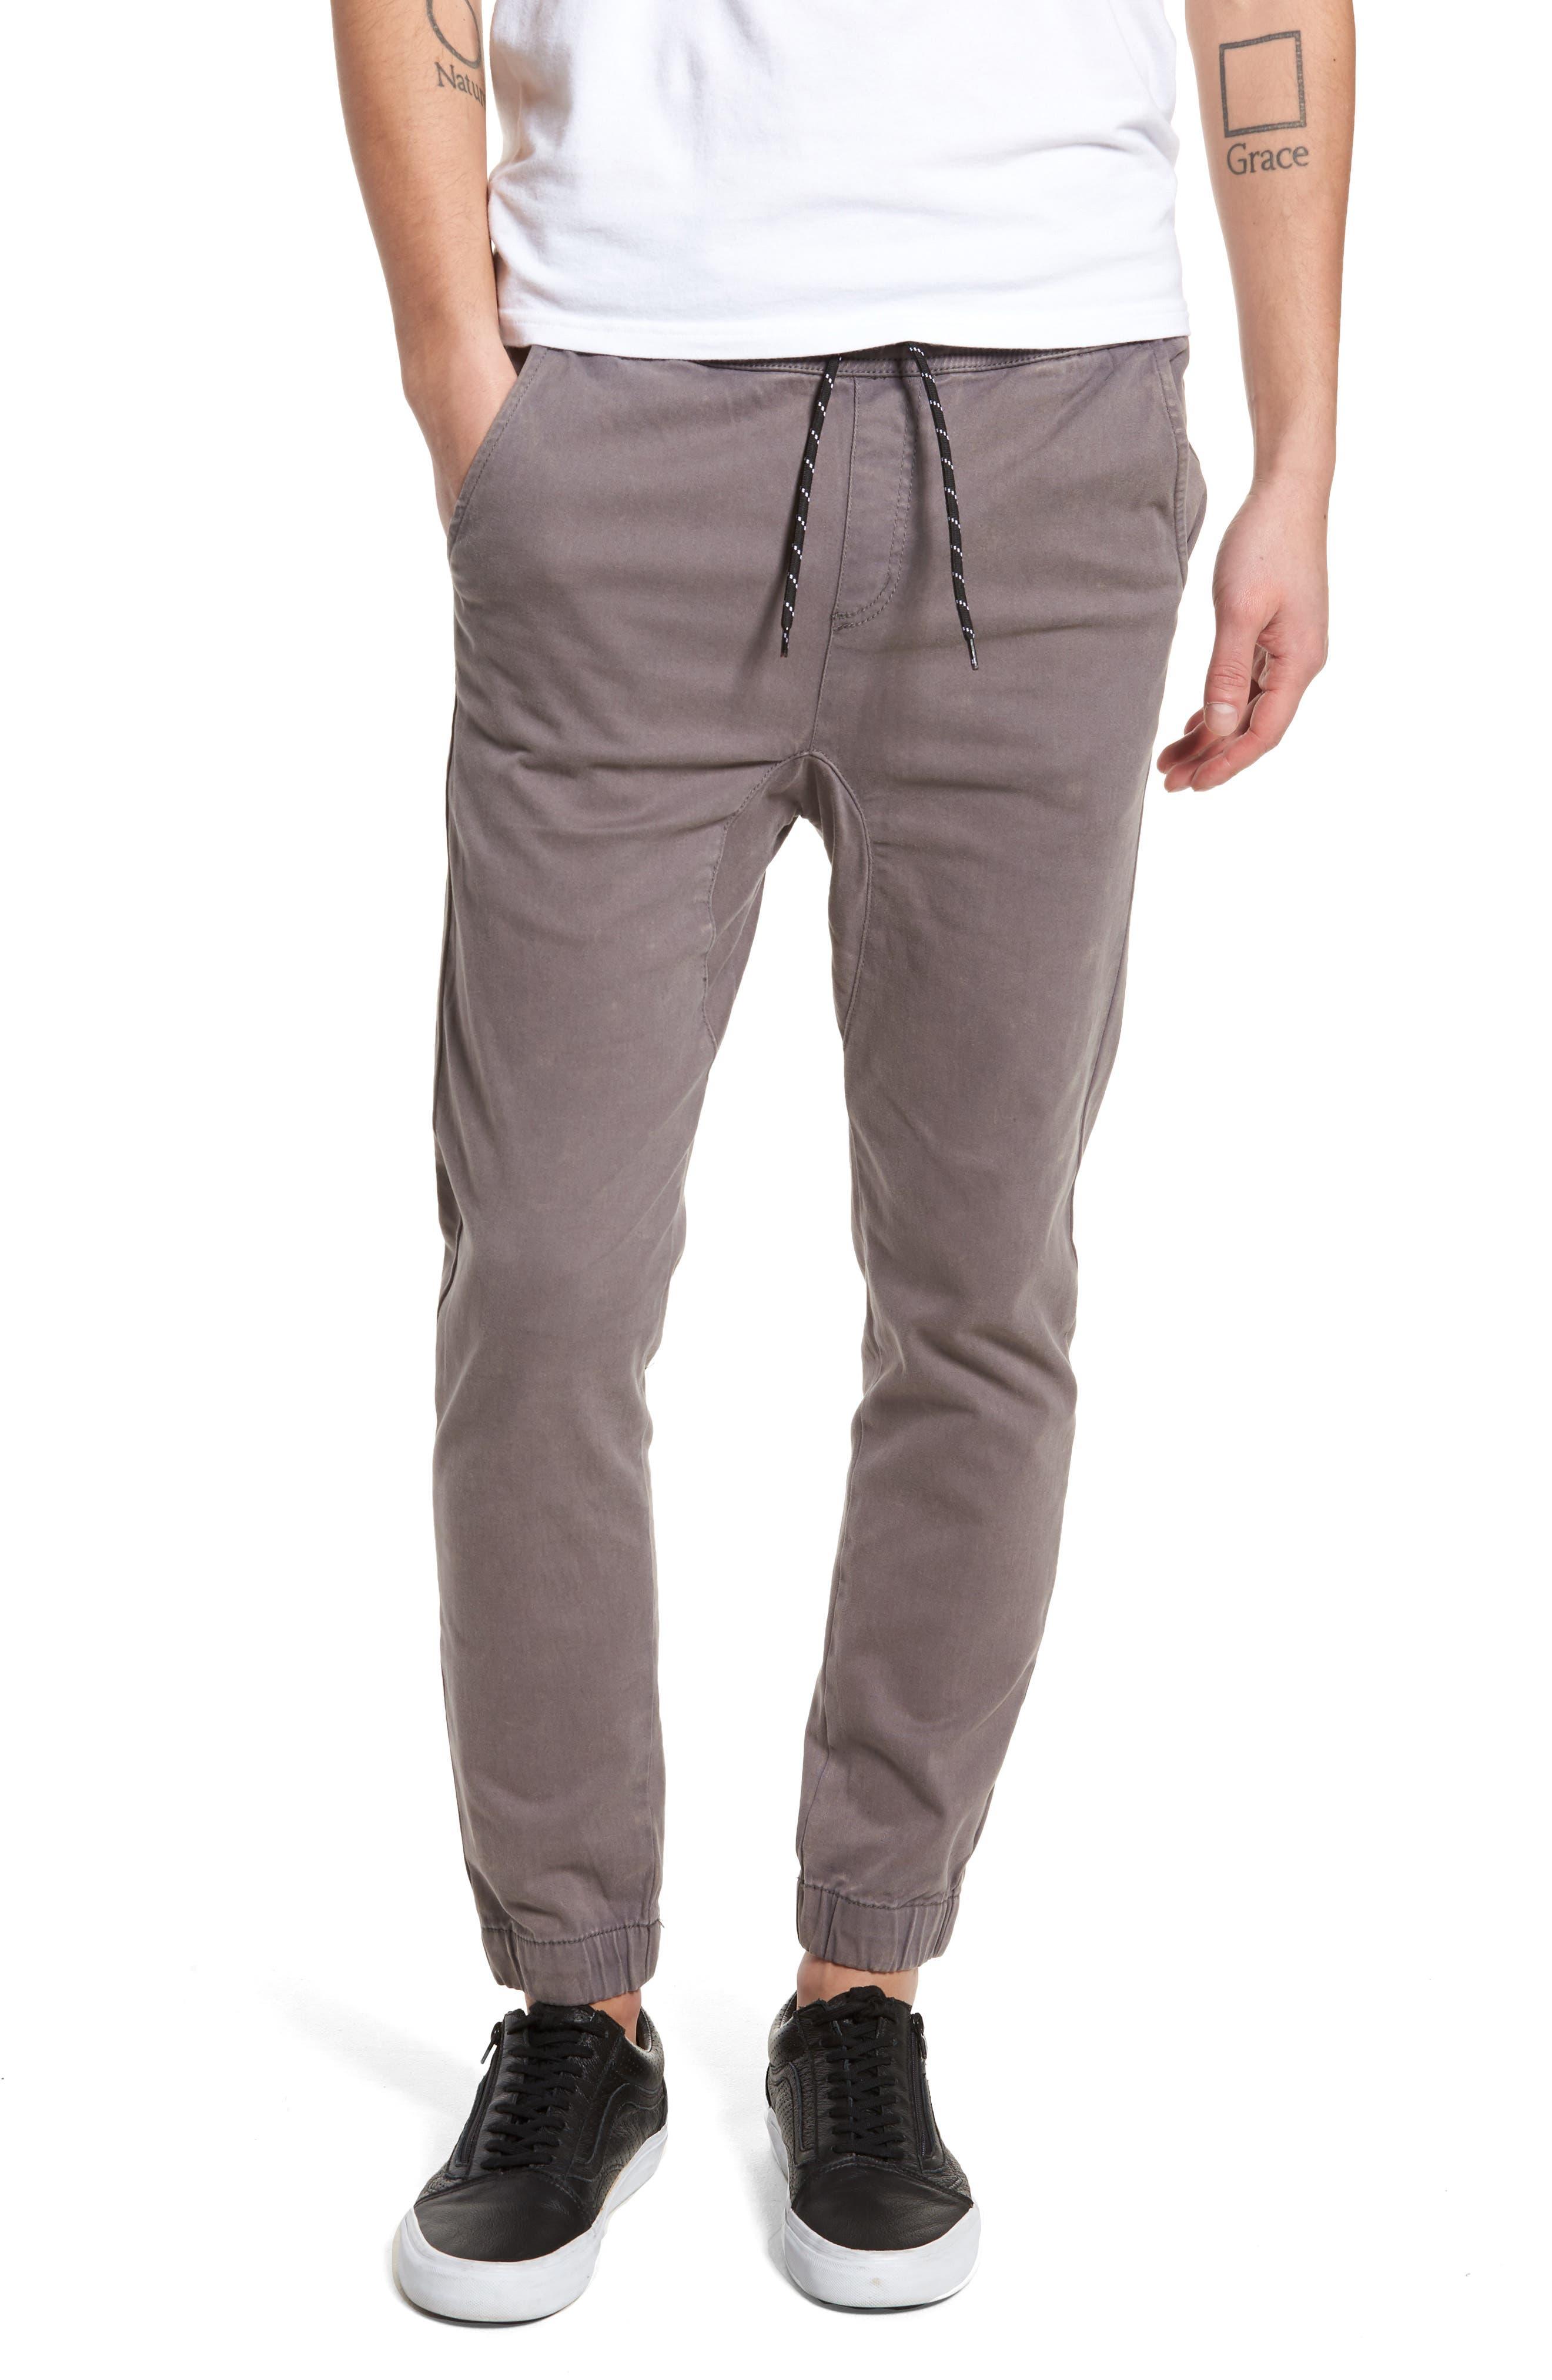 Alvaro Jogger Pants,                         Main,                         color, Charcoal